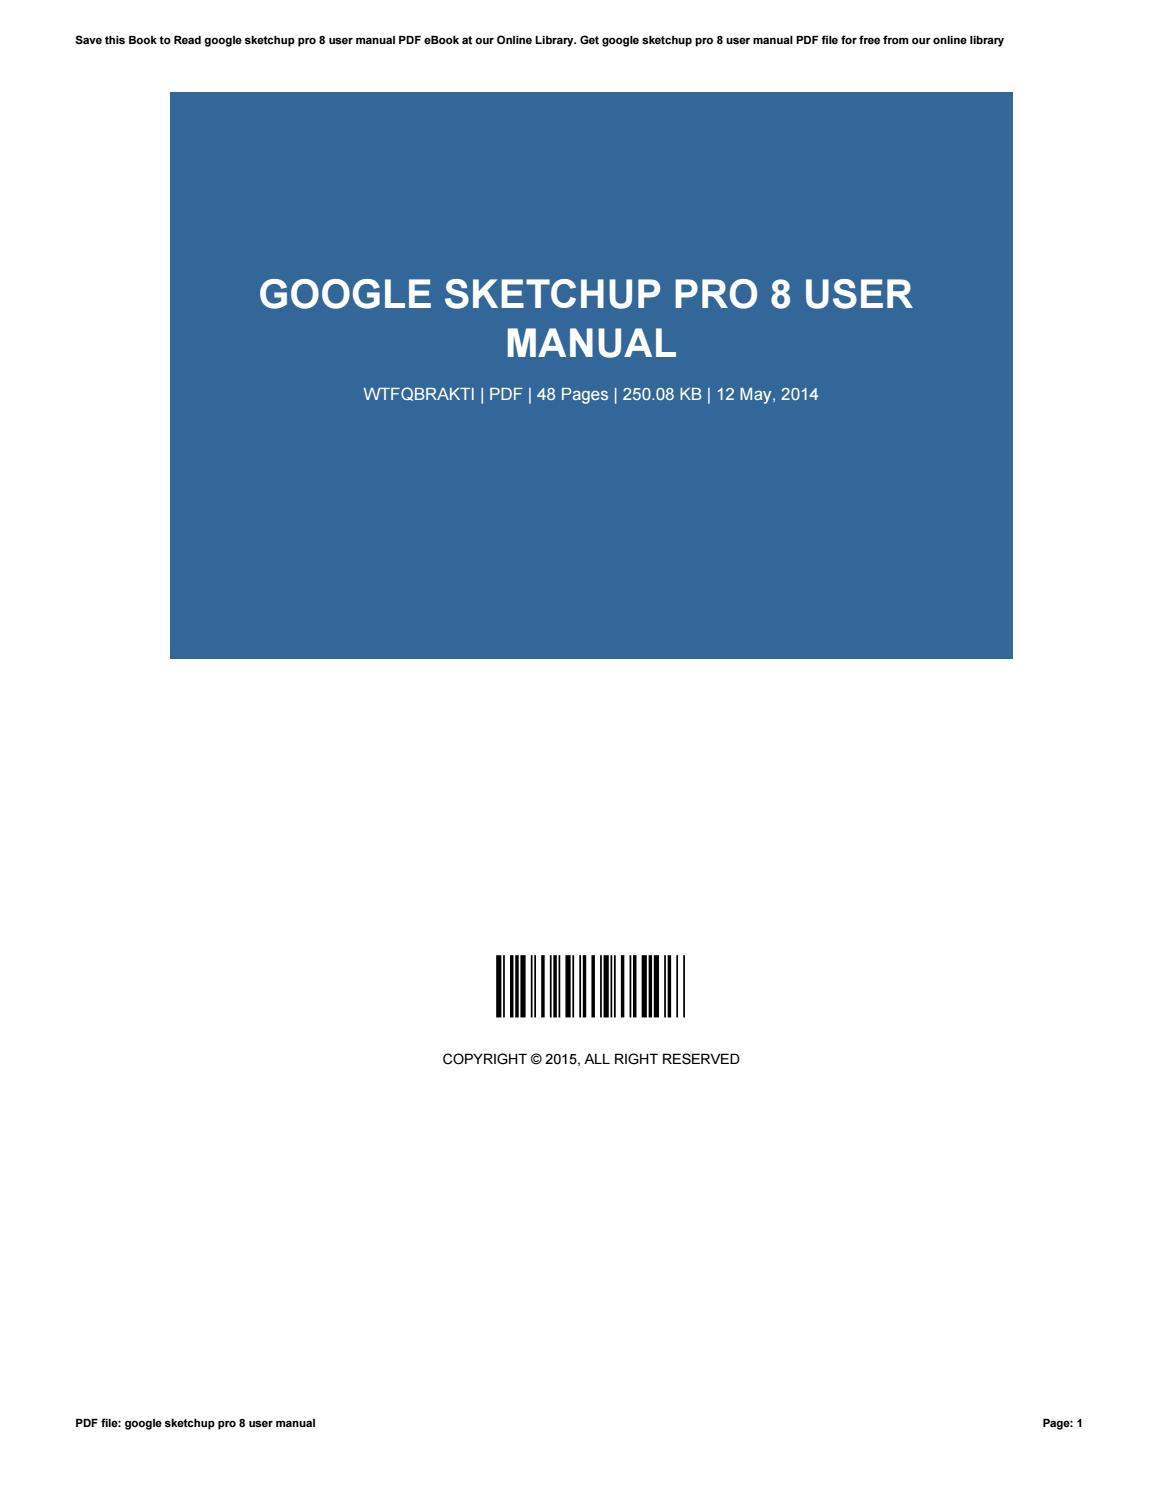 google sketchup pro 8 user manual by maryallison2918 issuu rh issuu com google sketchup manual pdf download google sketchup manual or tutorial pdf